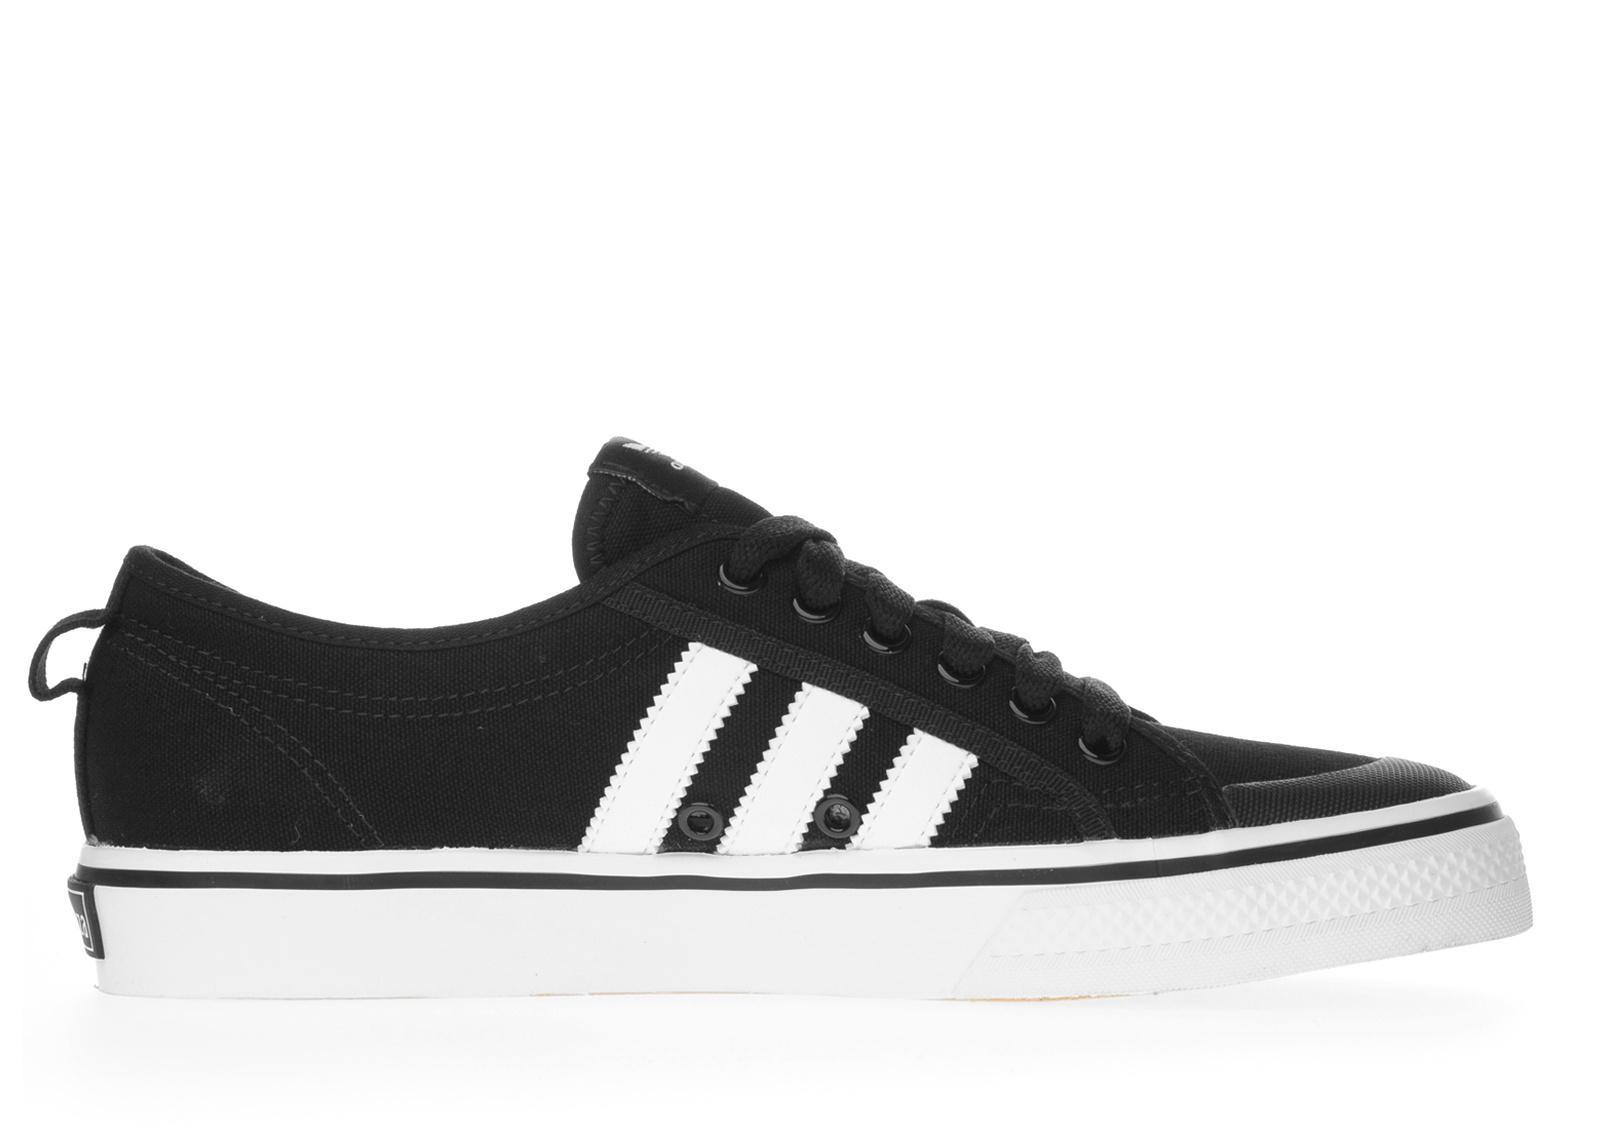 Adidas nizza black and white dresses